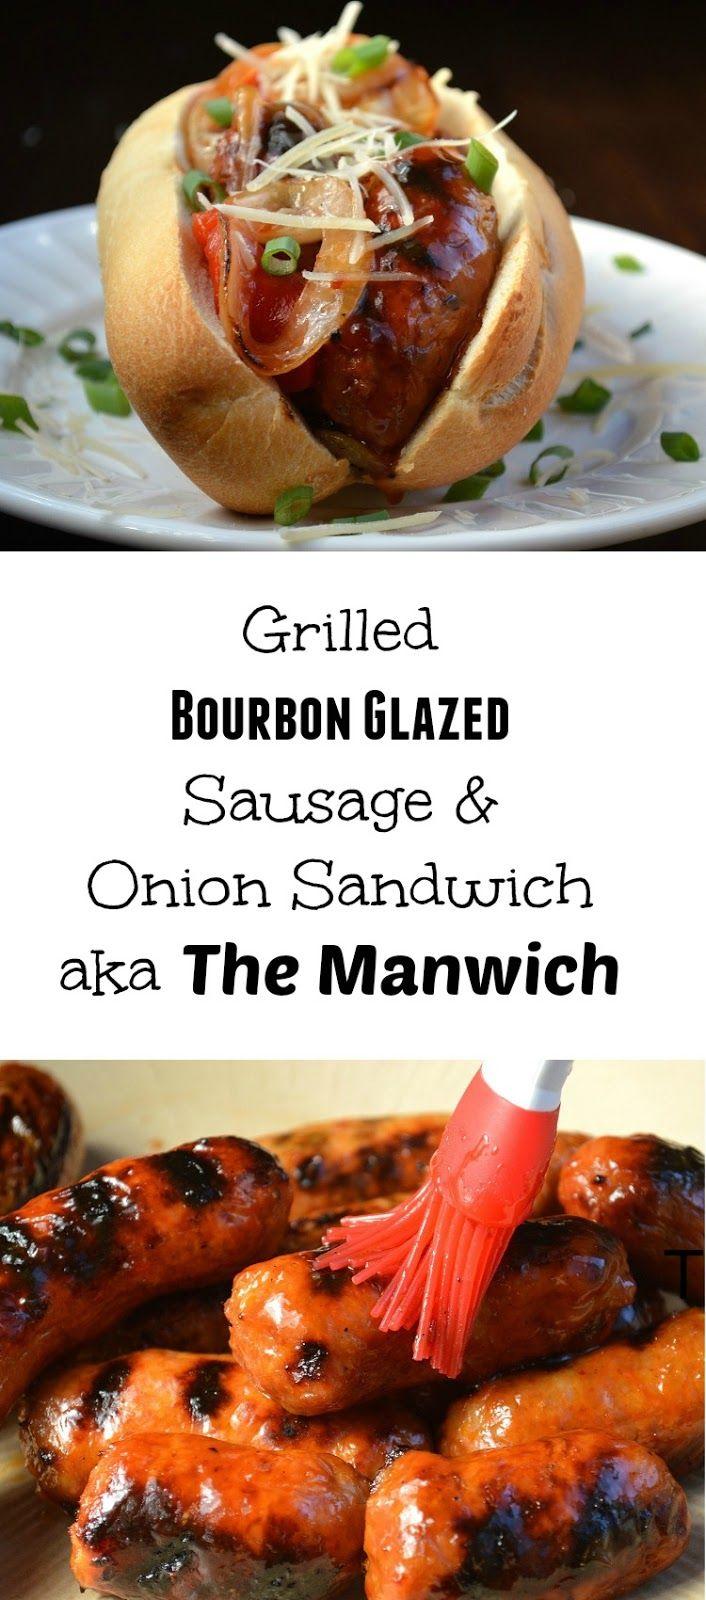 Grilled Bourbon Glazed Sausage & Onion Manwich